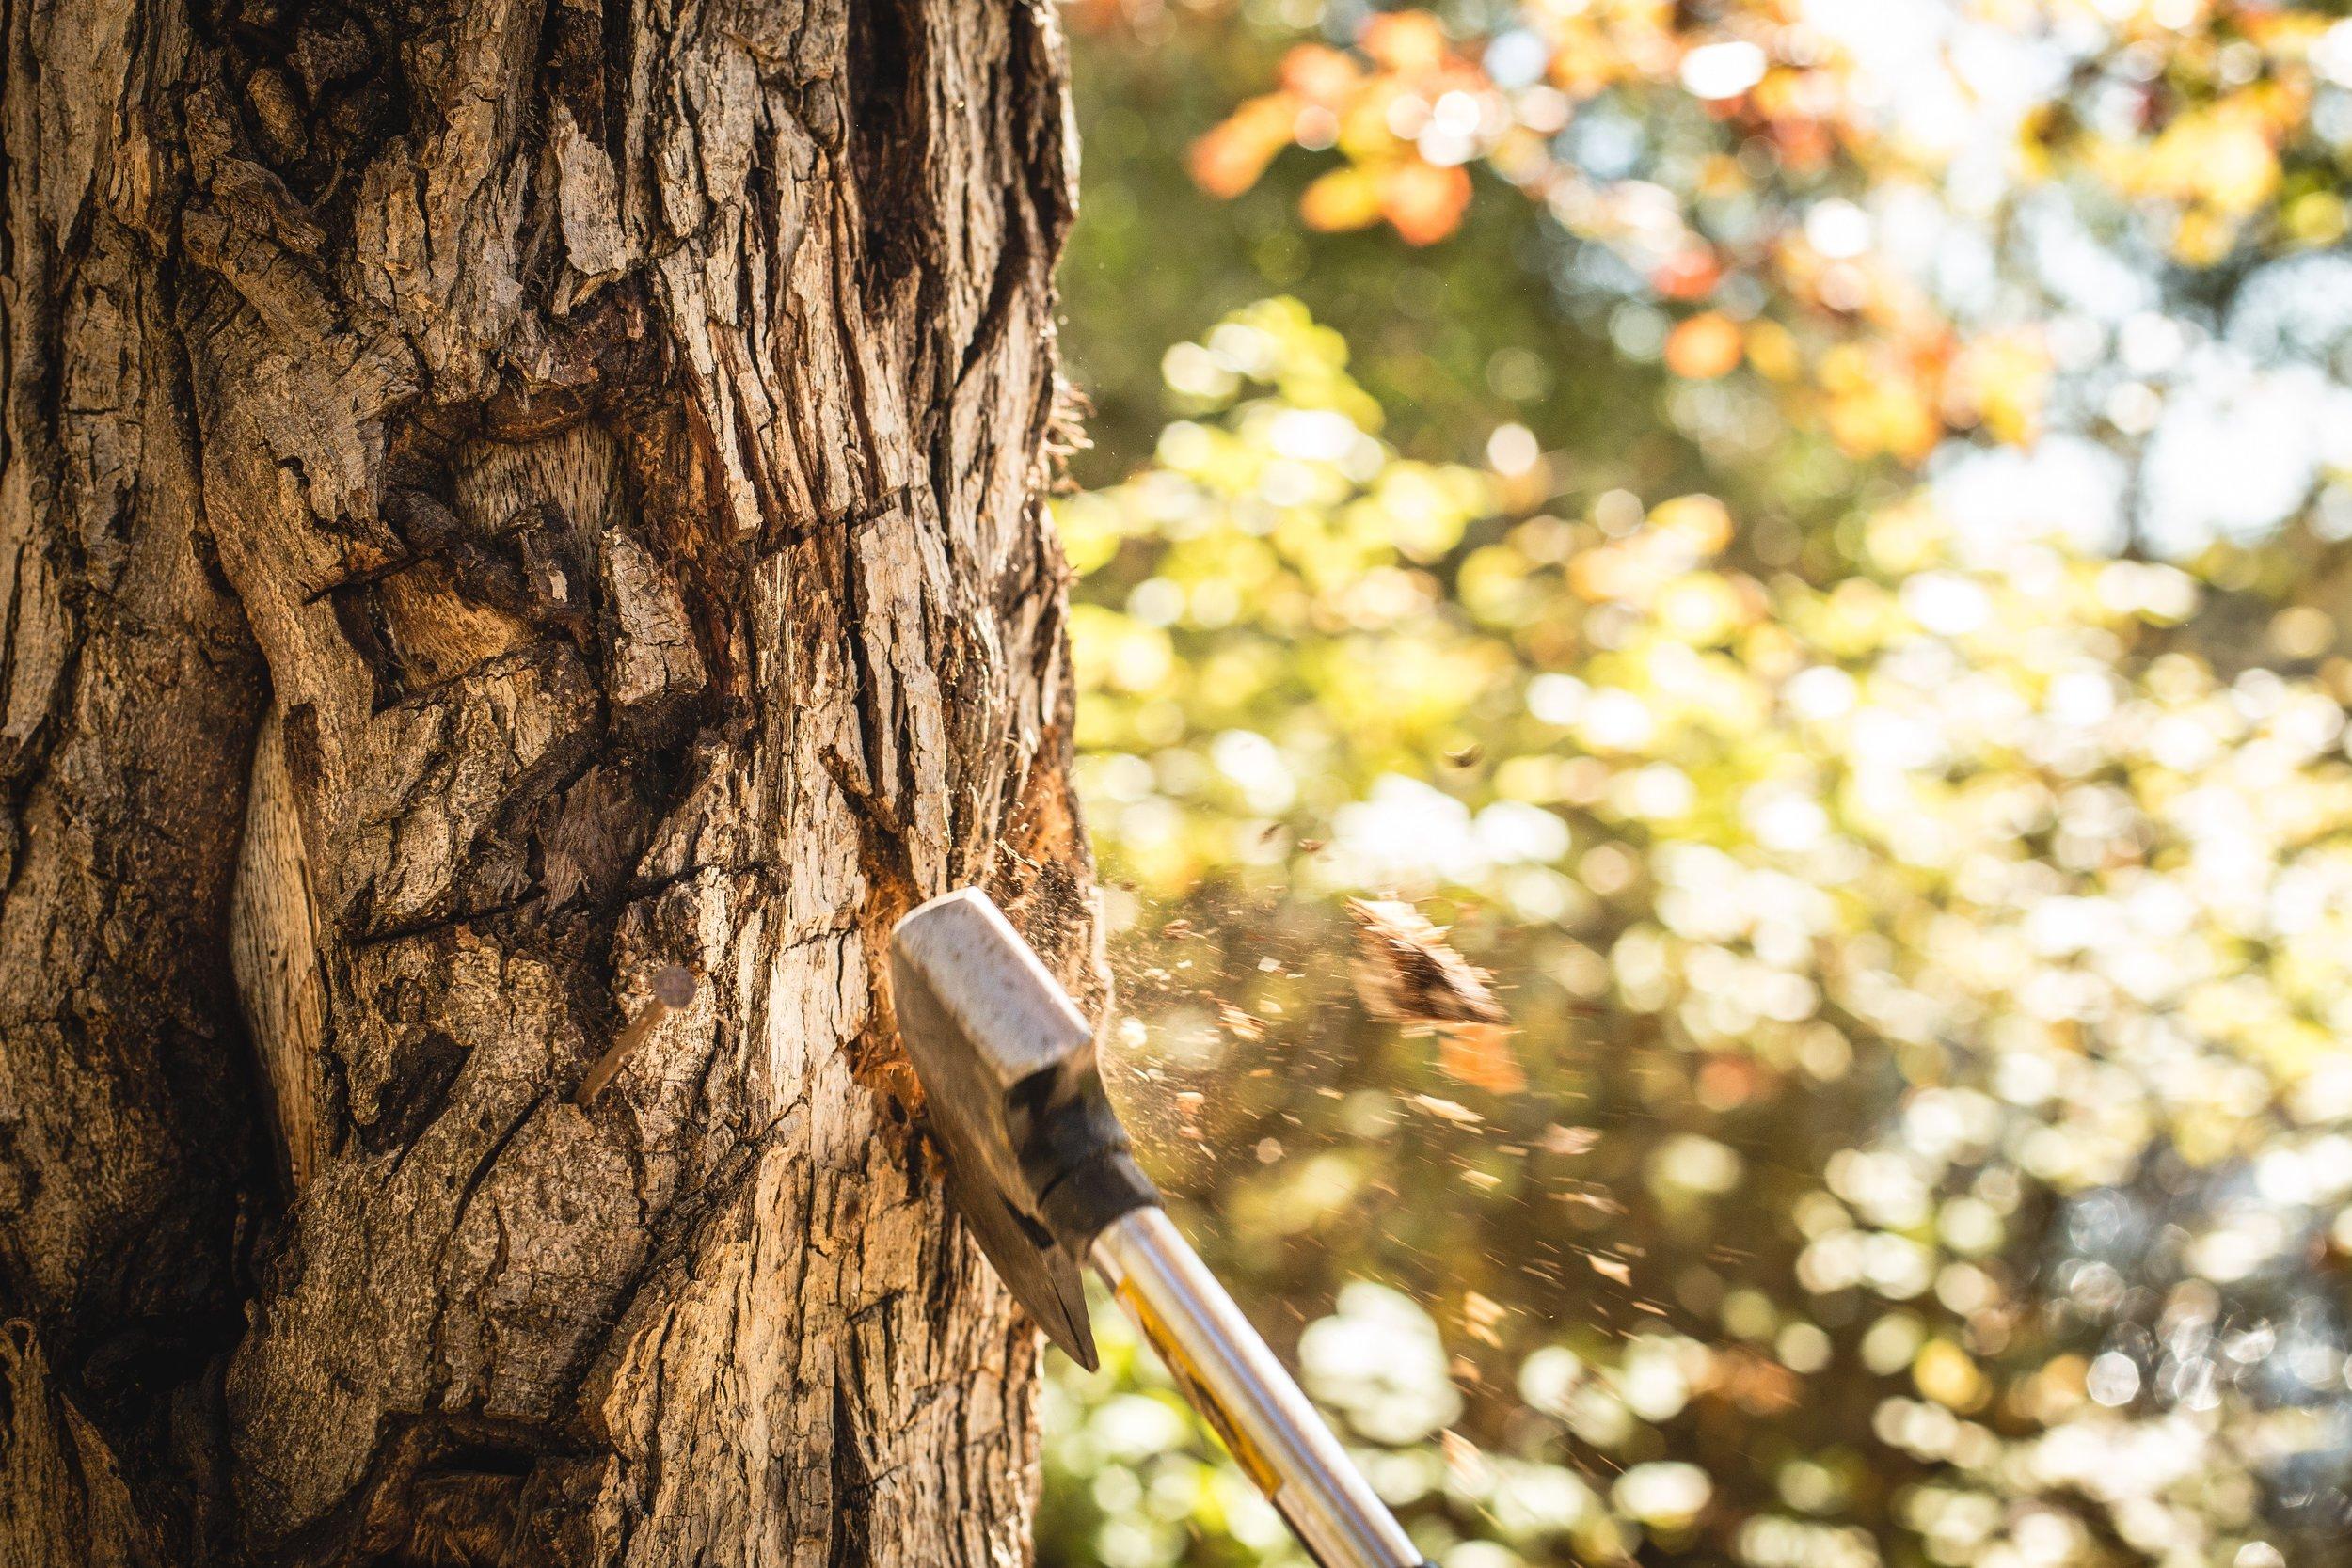 ax-axe-cut-a-tree-12157.jpg